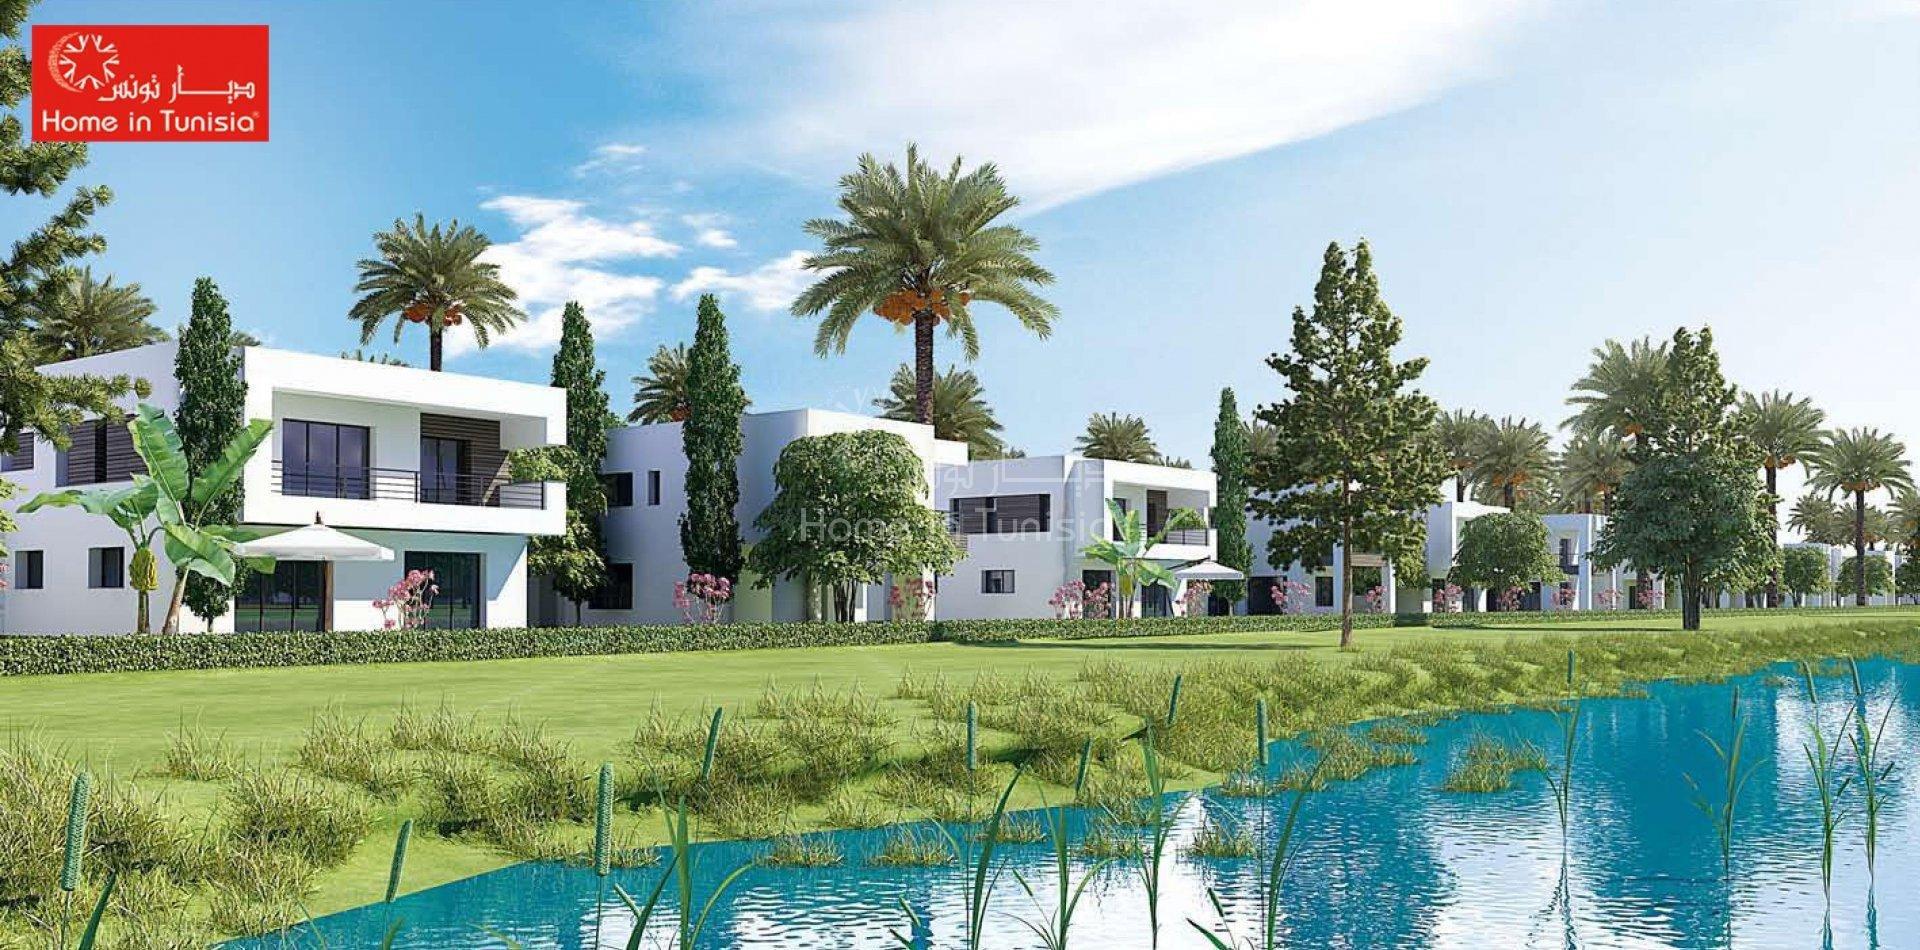 Tunis Bay résidentiel golf villa Capitole jumelée